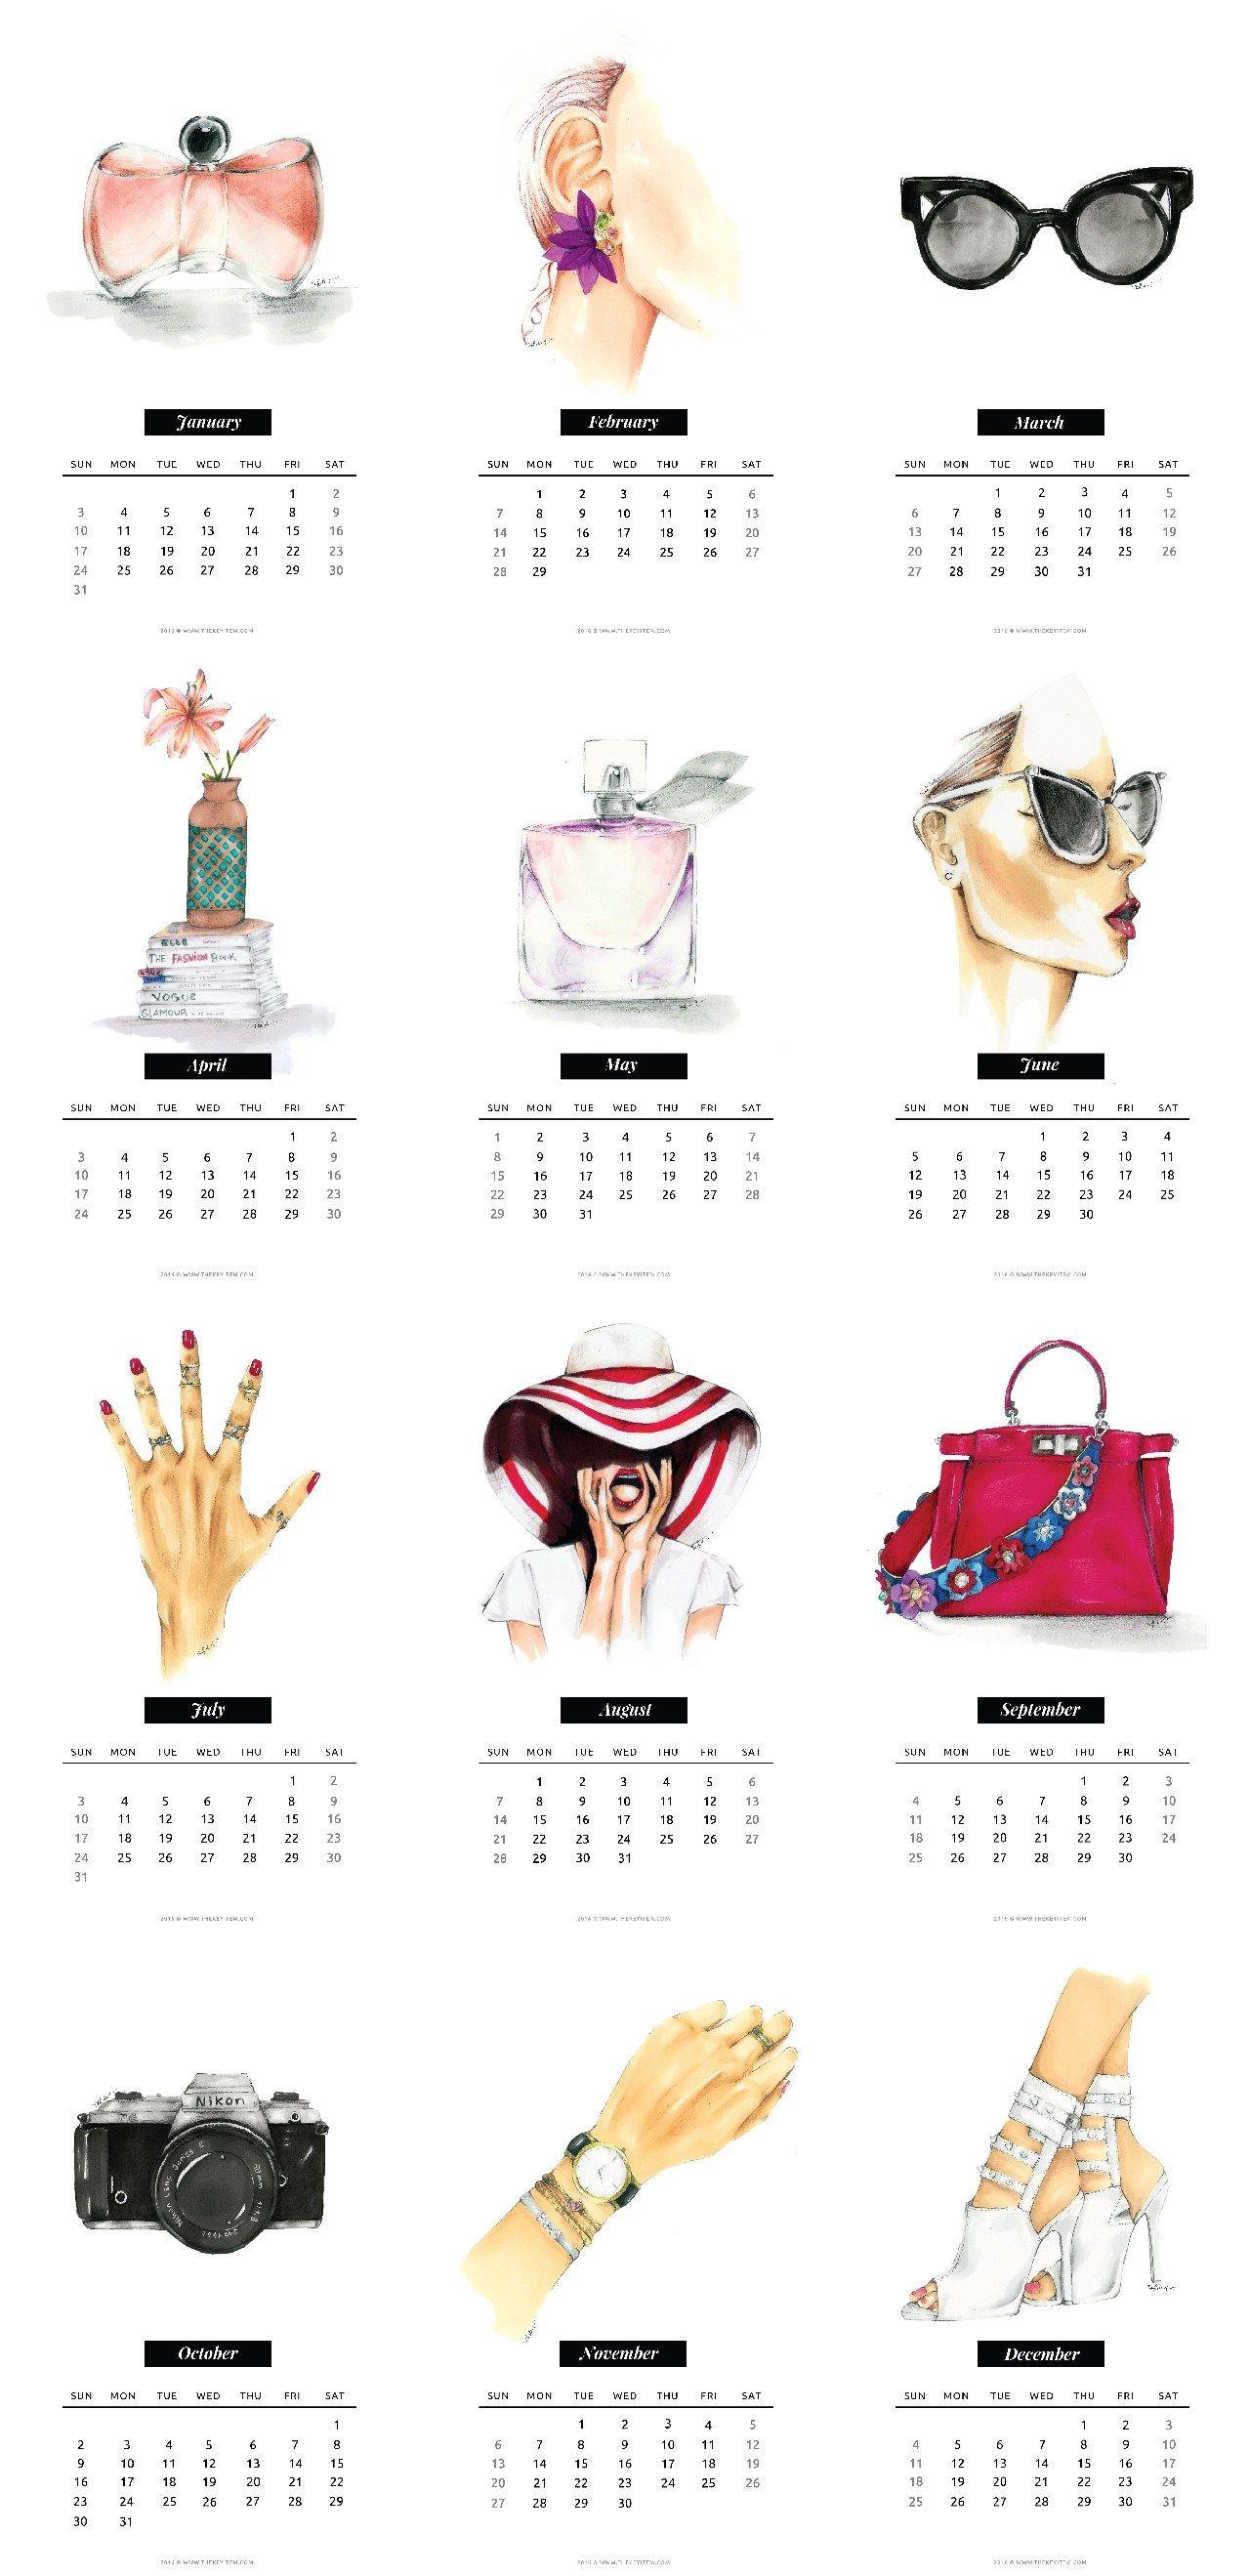 Calendario De 2019 Para Imprimir Gratis Más Caliente Calendario Ilustrado 2016 Gratis Pinterest Of Calendario De 2019 Para Imprimir Gratis Más Actual Pin De Calendario Hispano En Calendario Lunar A±o 2018